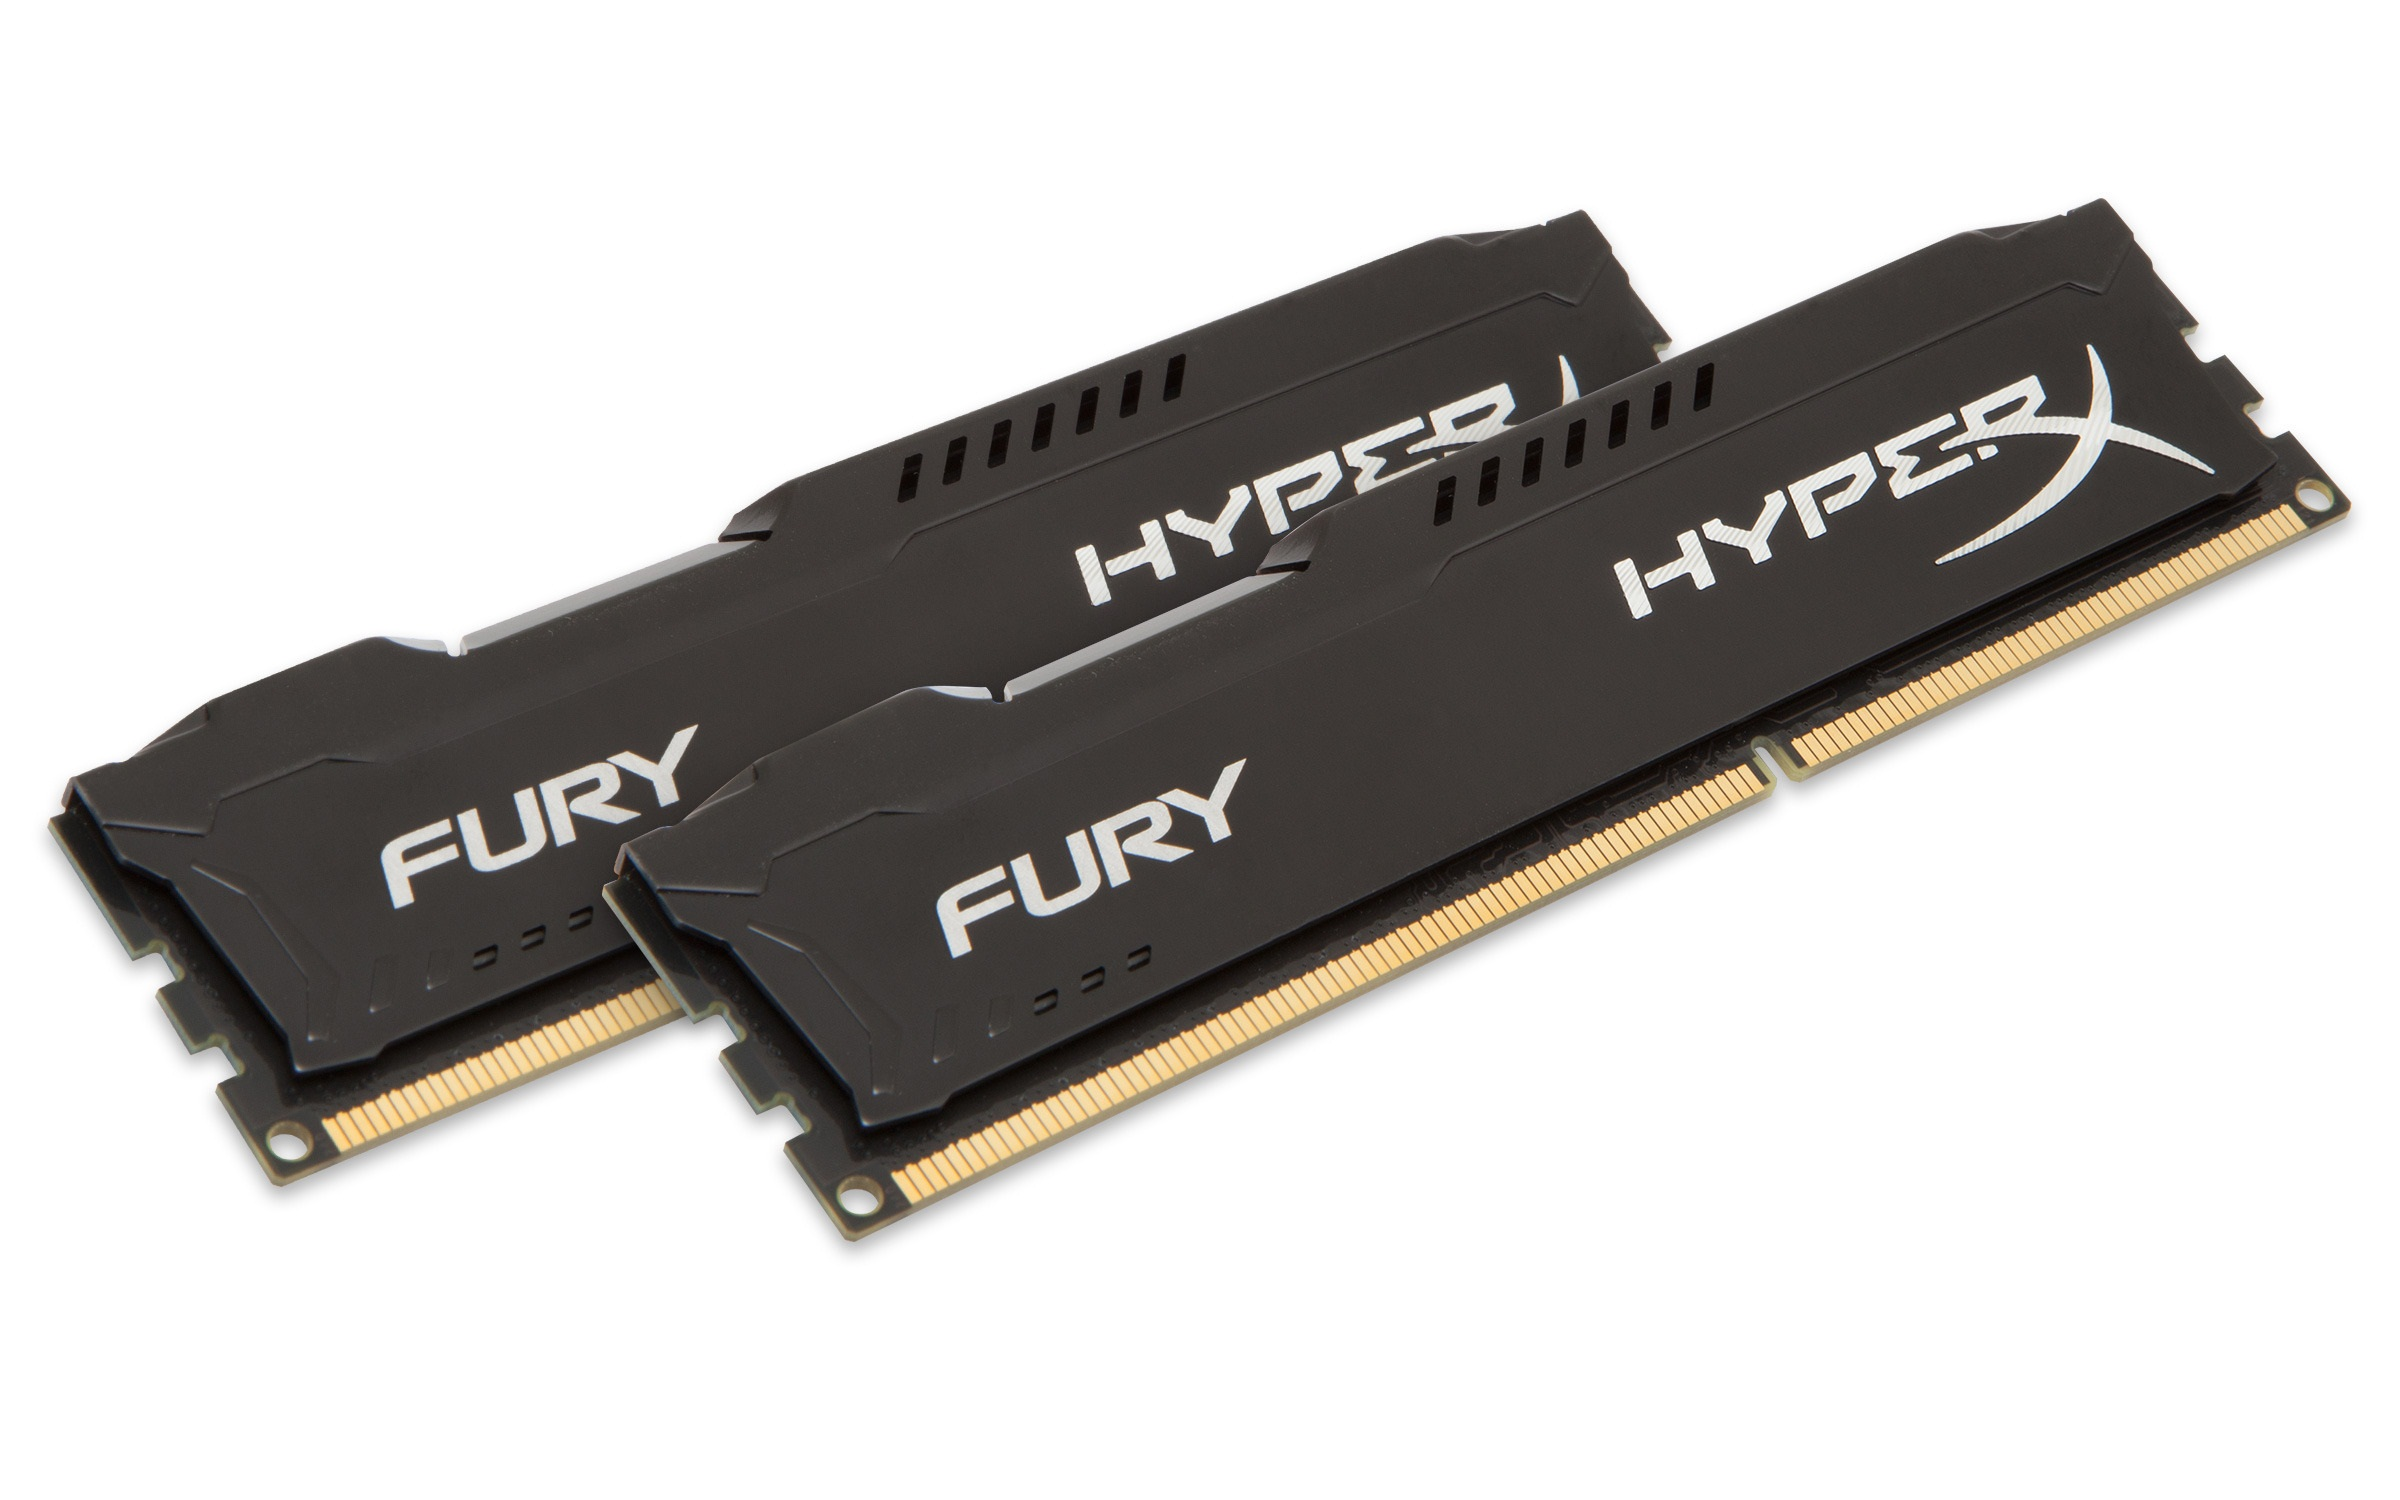 KINGSTON 8GB 1333MHz DDR3 CL9 DIMM (Kit of 2) HyperX FURY Black Series